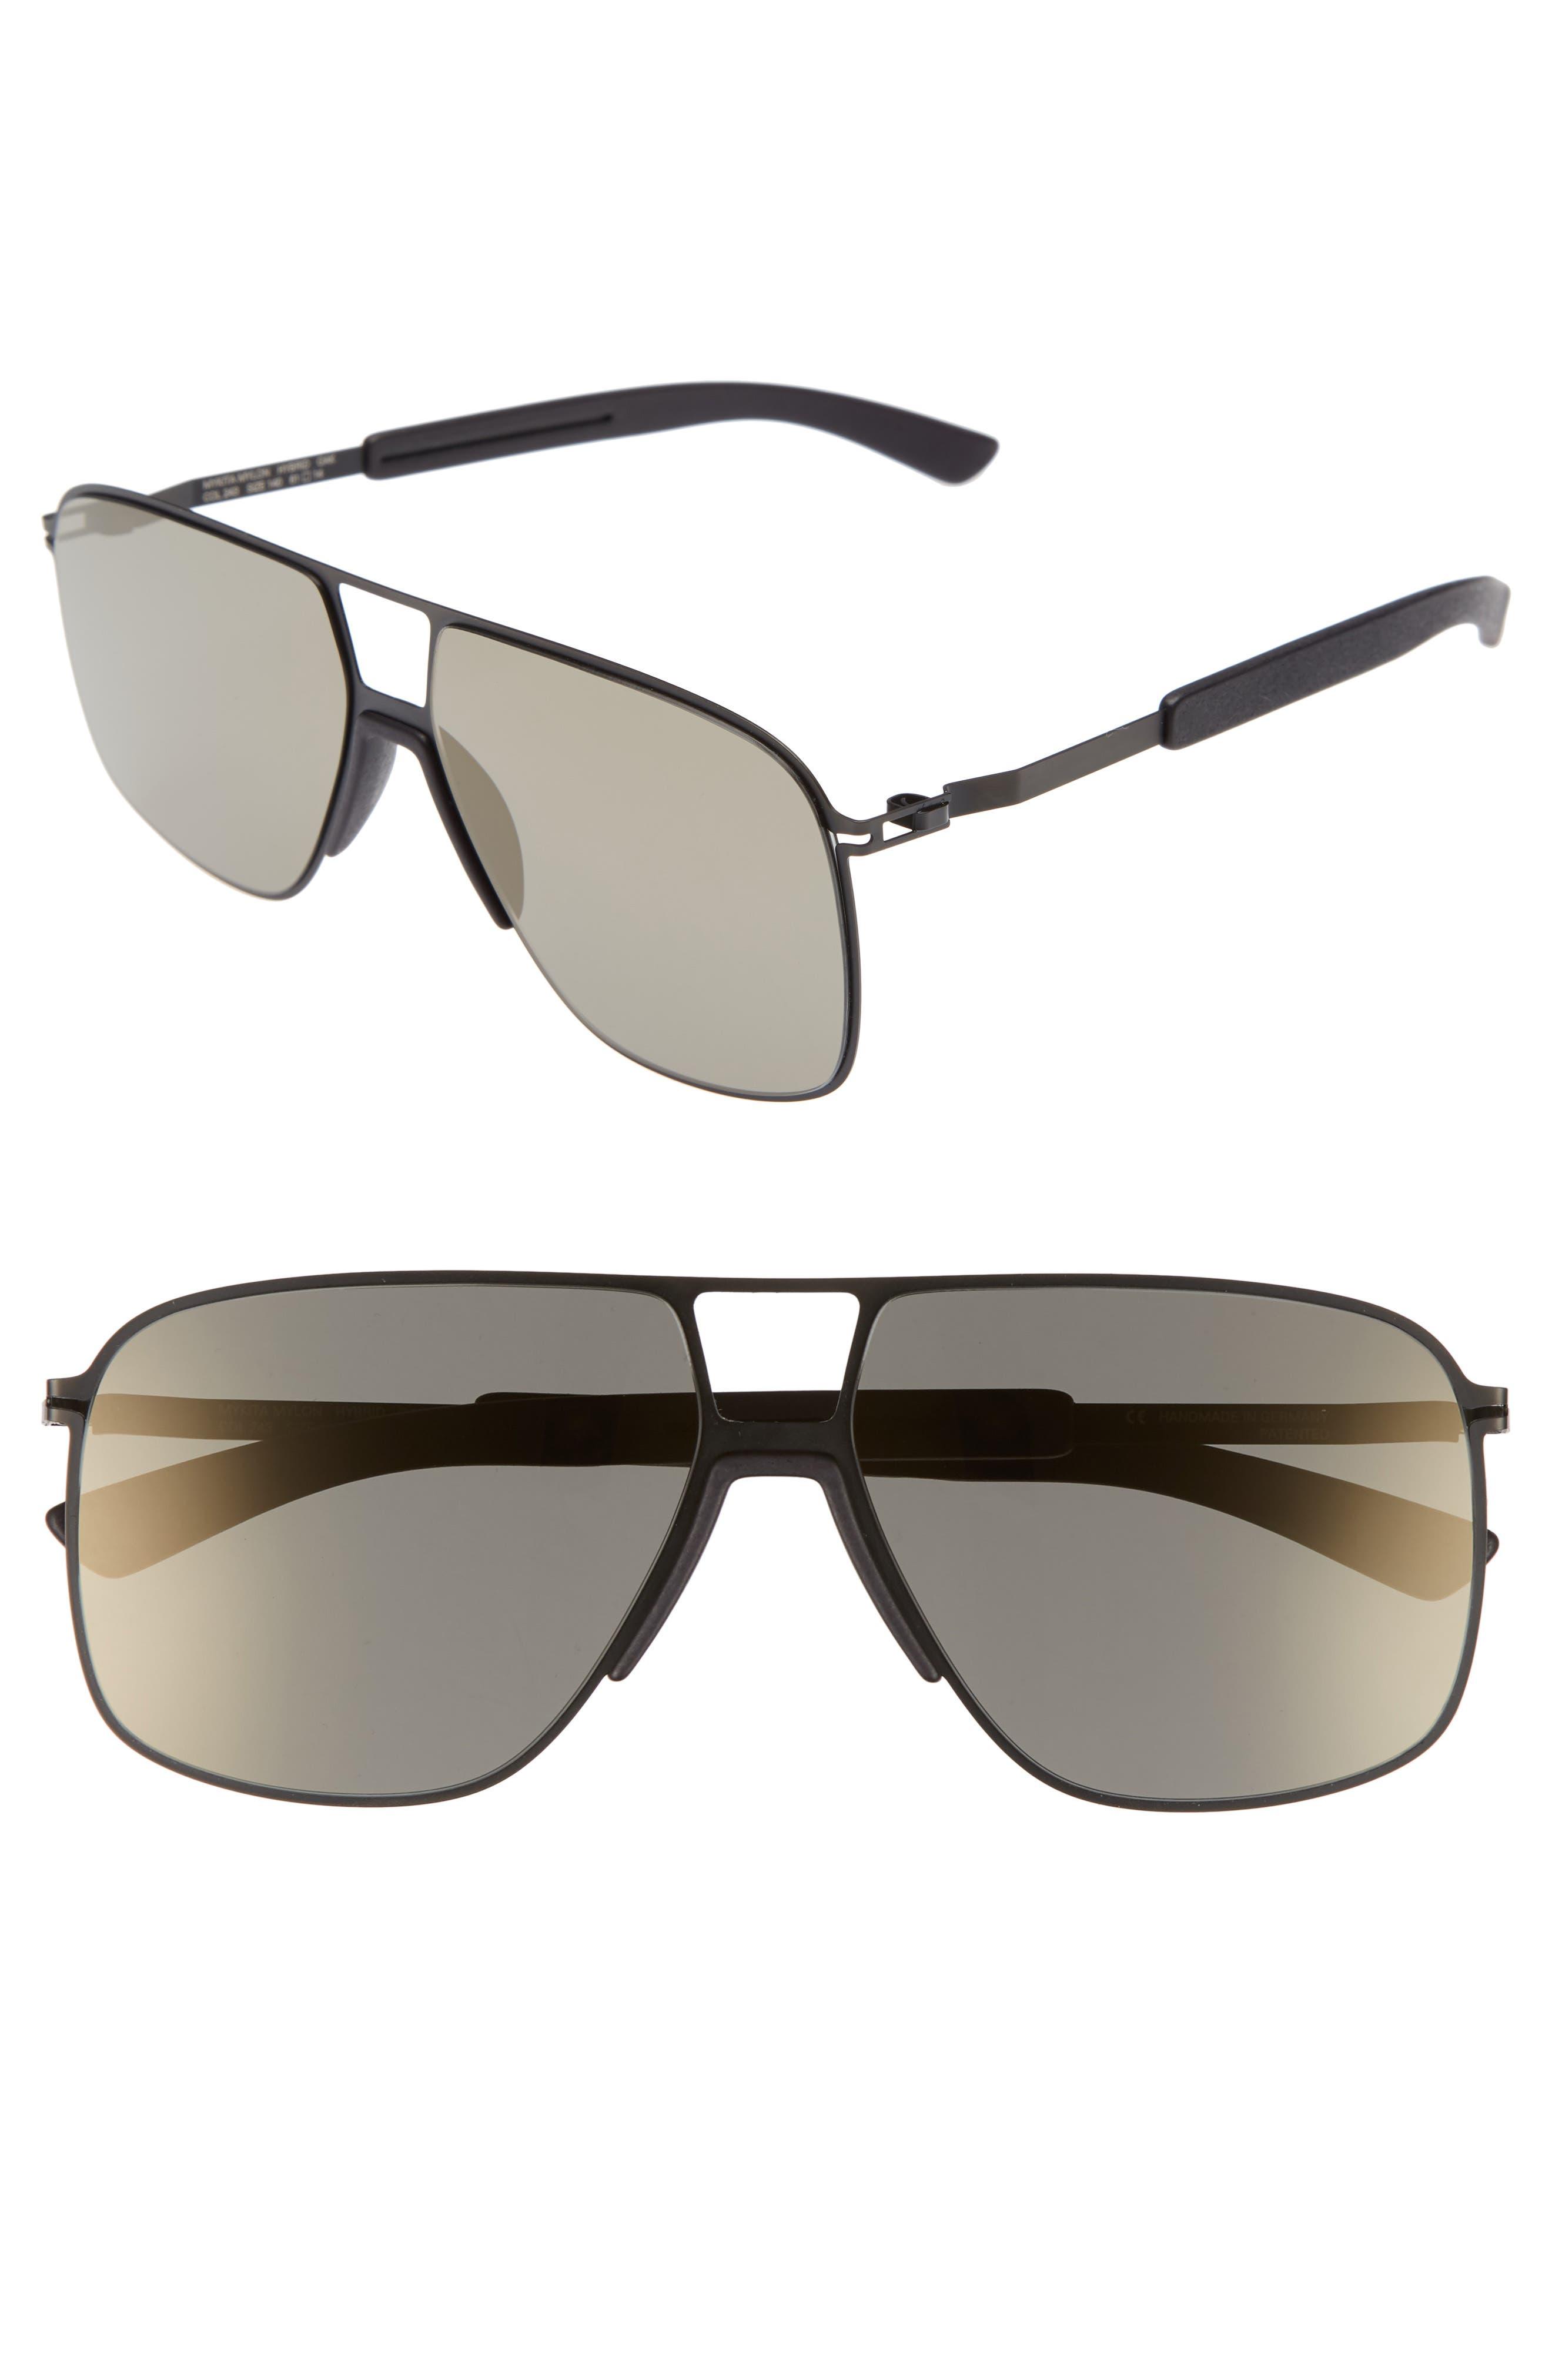 Oak 61mm Aviator Sunglasses,                         Main,                         color,